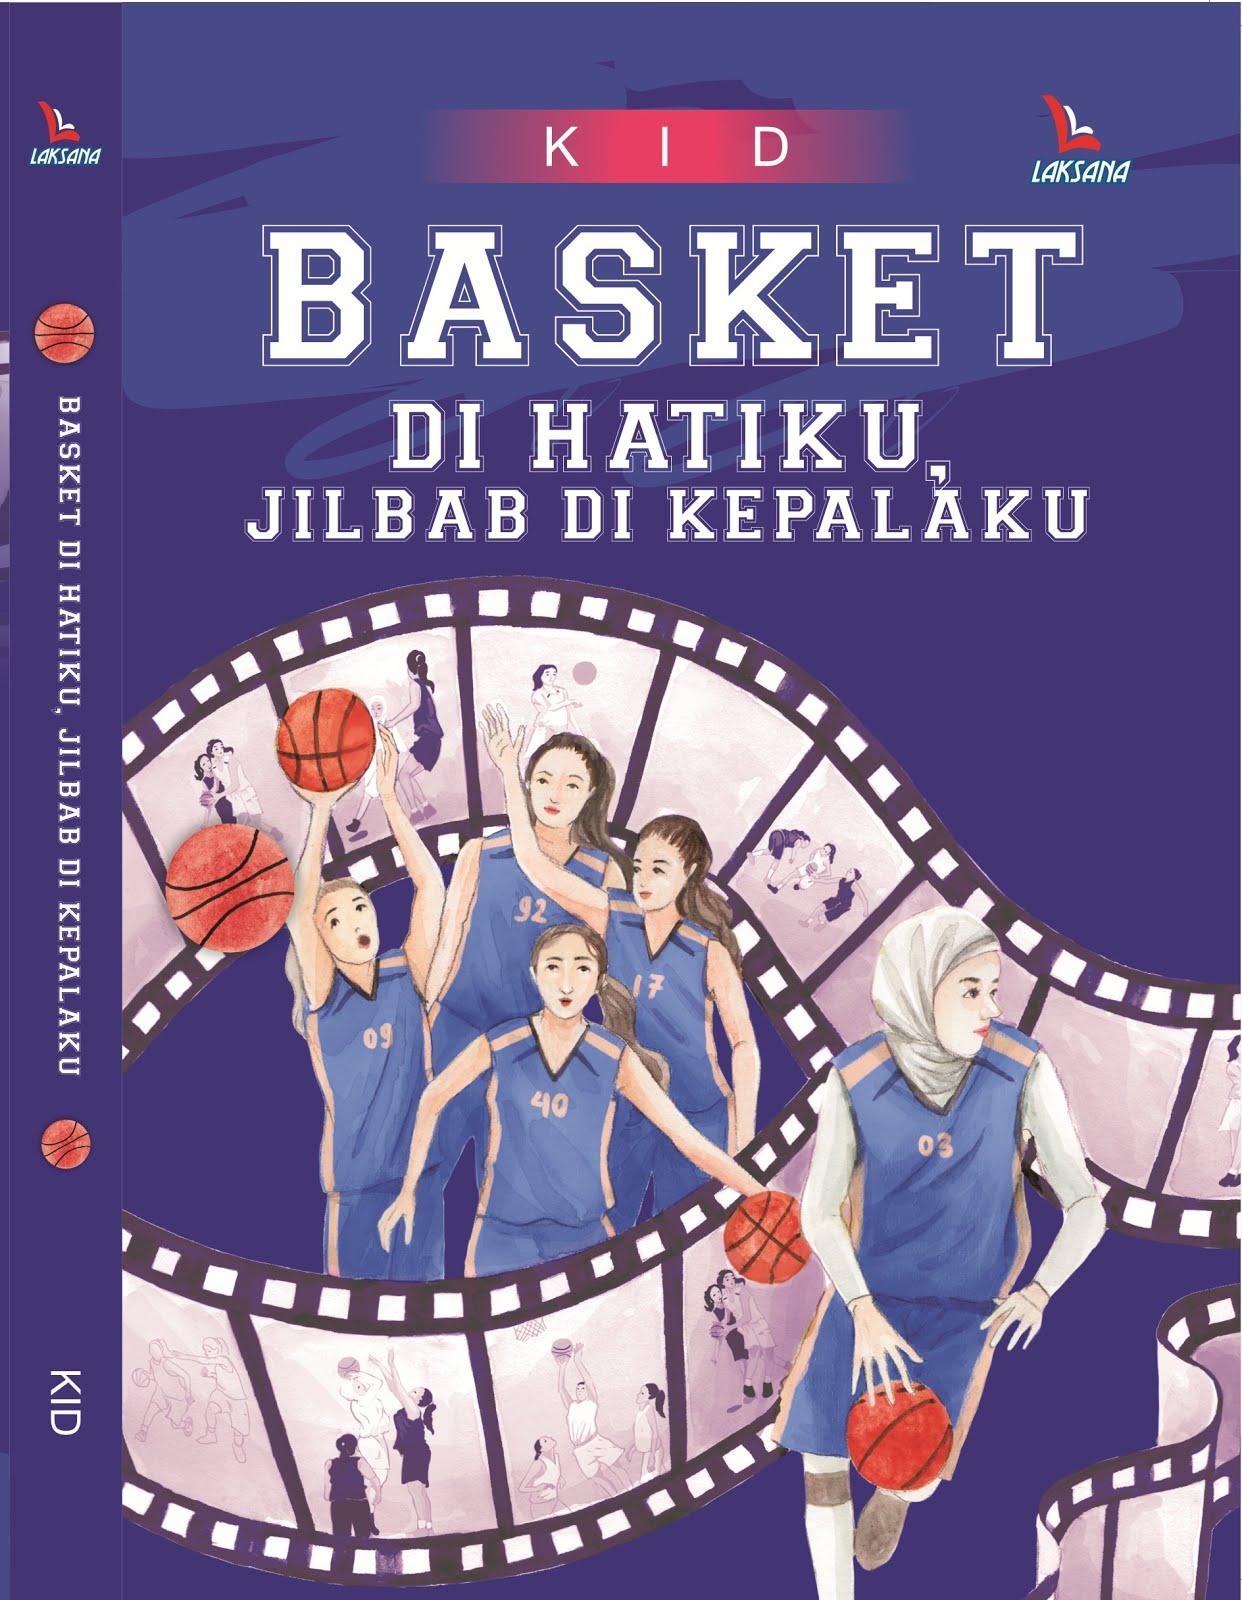 Klik gambar untuk order novel Basket di Hatiku Jilbab di Kepalaku